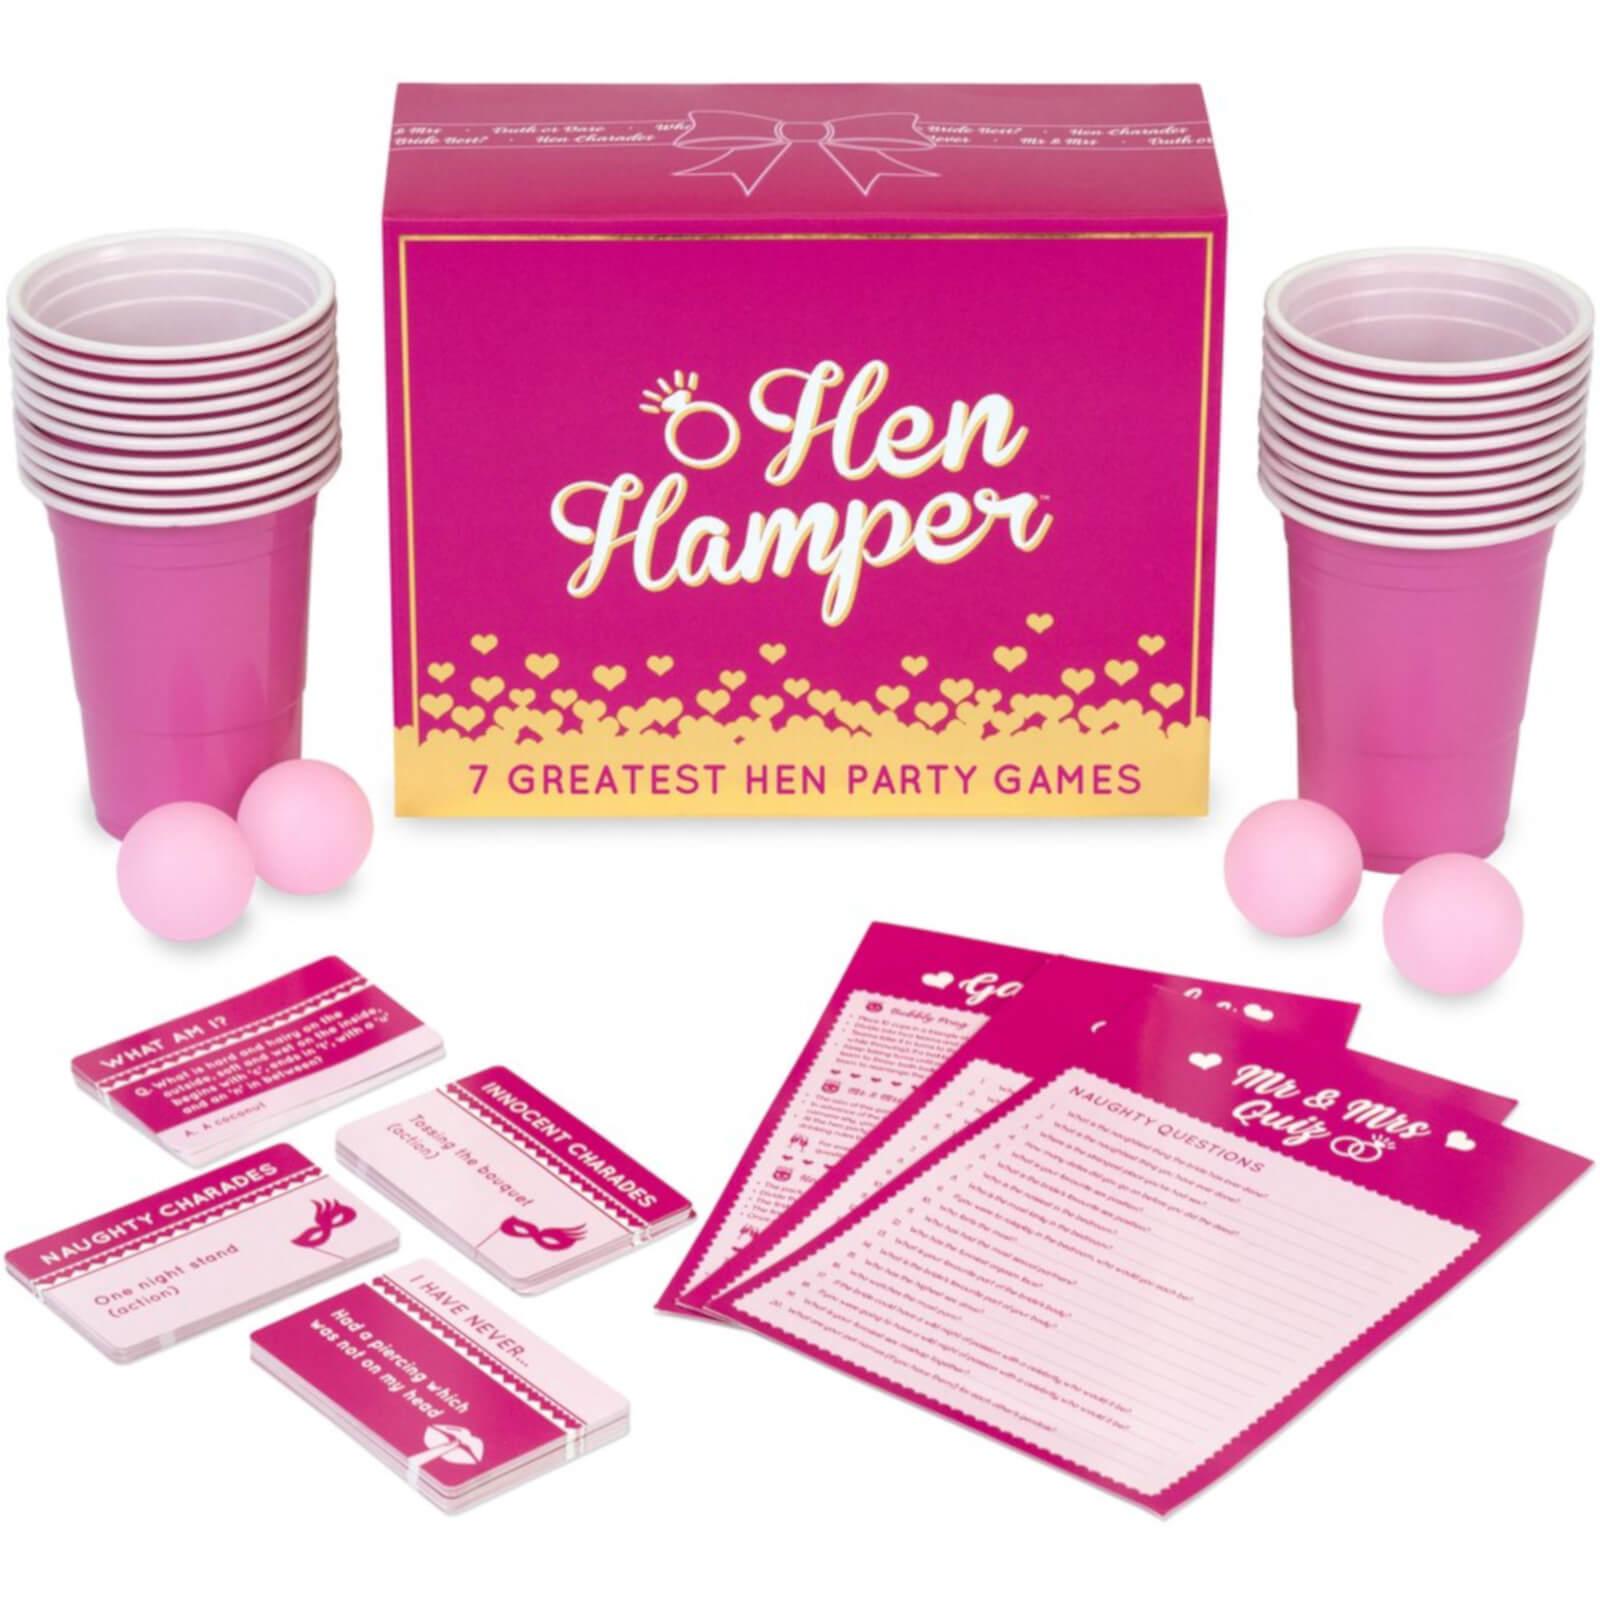 Gutter Games Hen Hamper 7 Greatest Hen Party Games